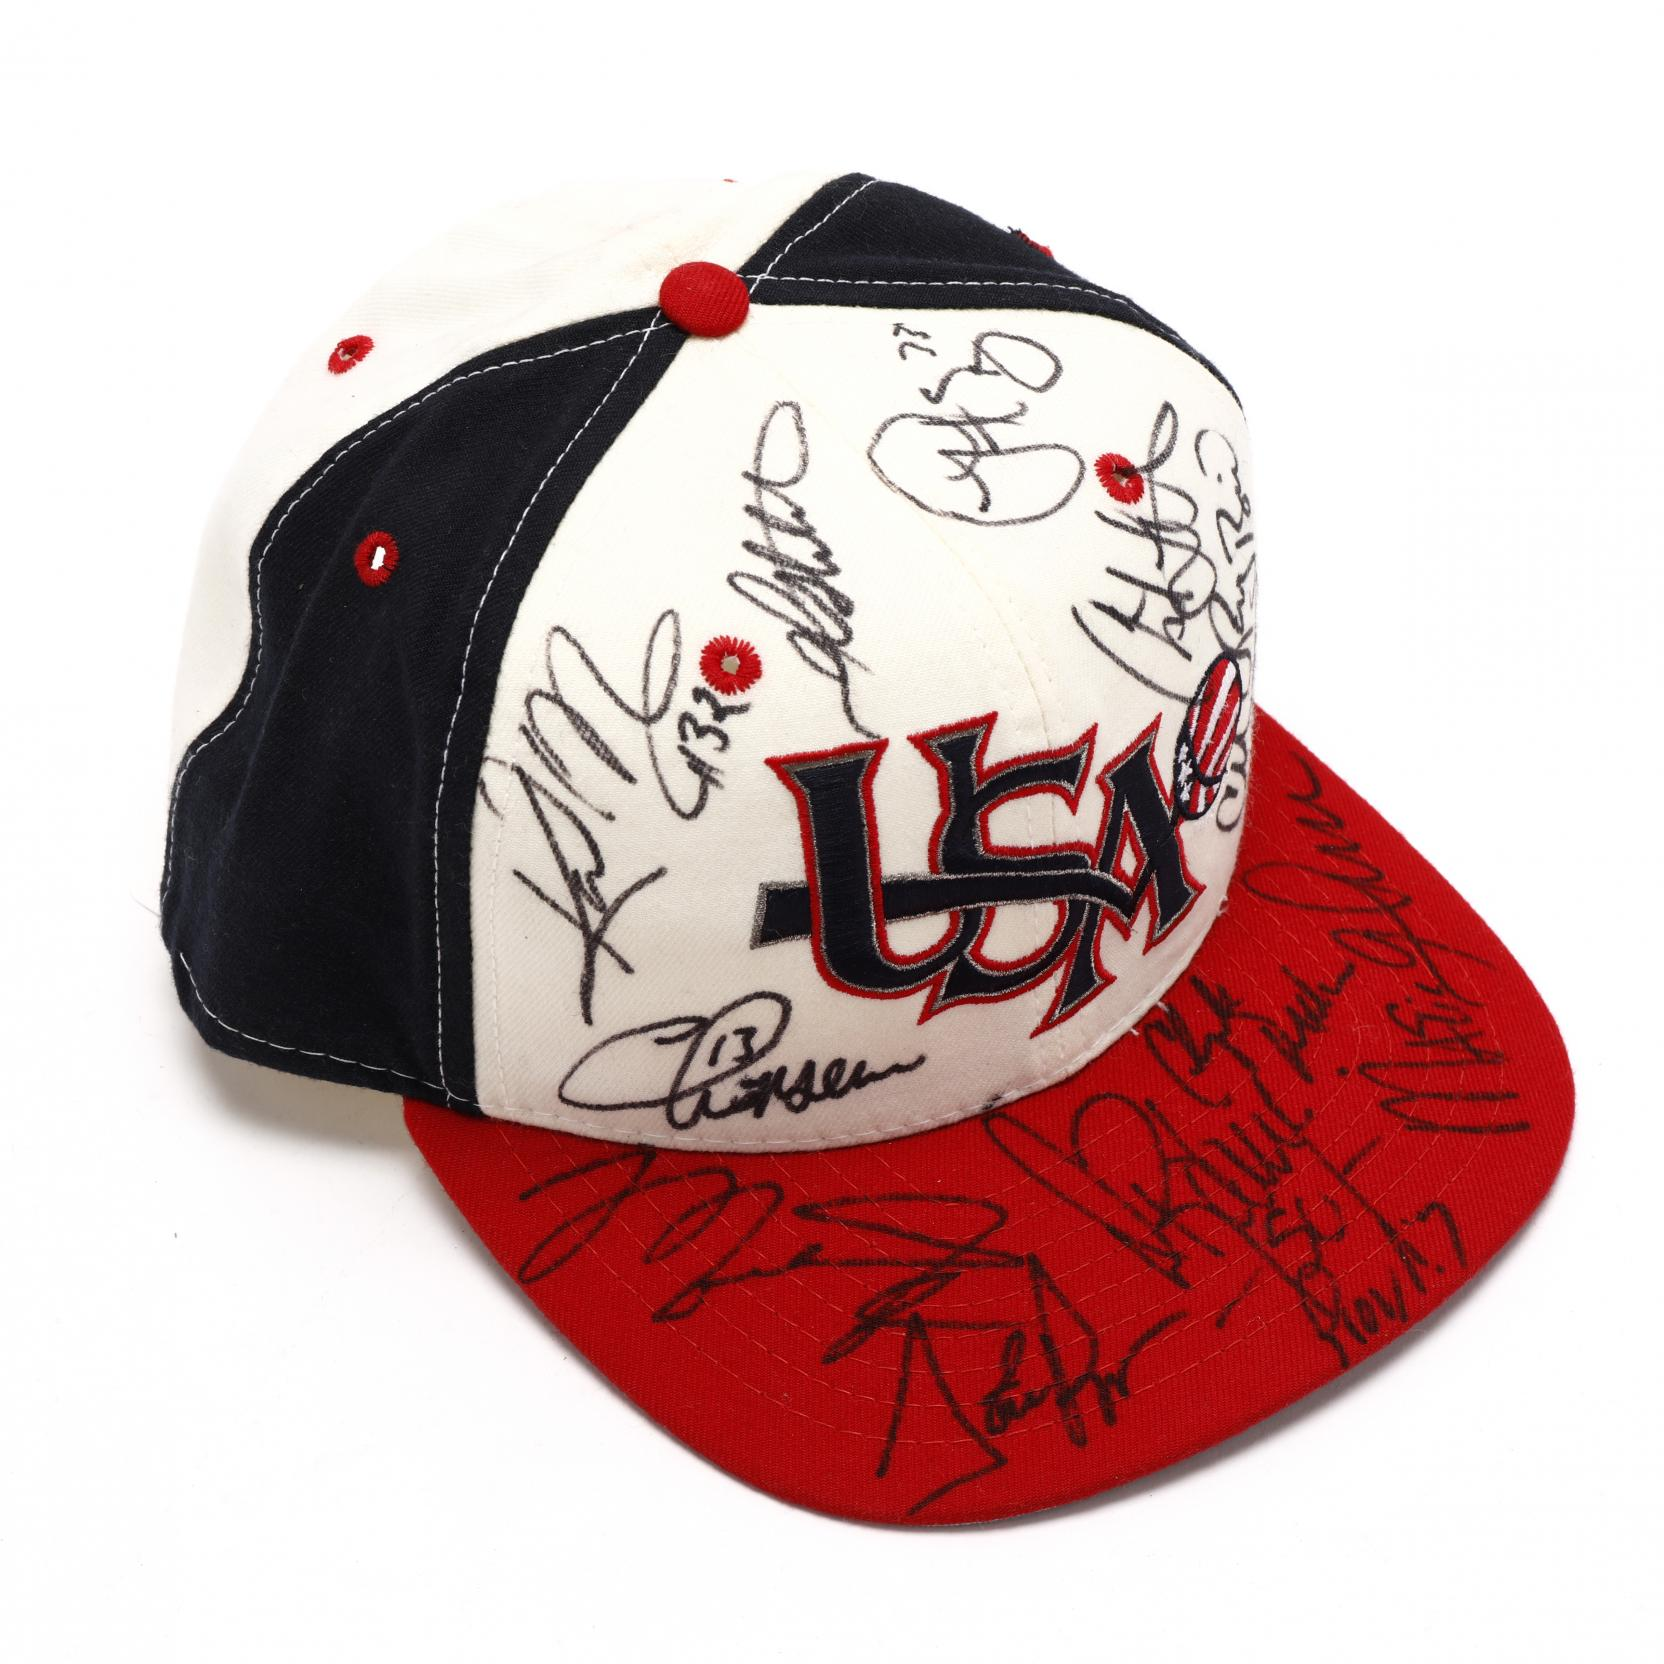 usa-1992-olympic-basketball-team-cap-signed-jordan-drexler-pippen